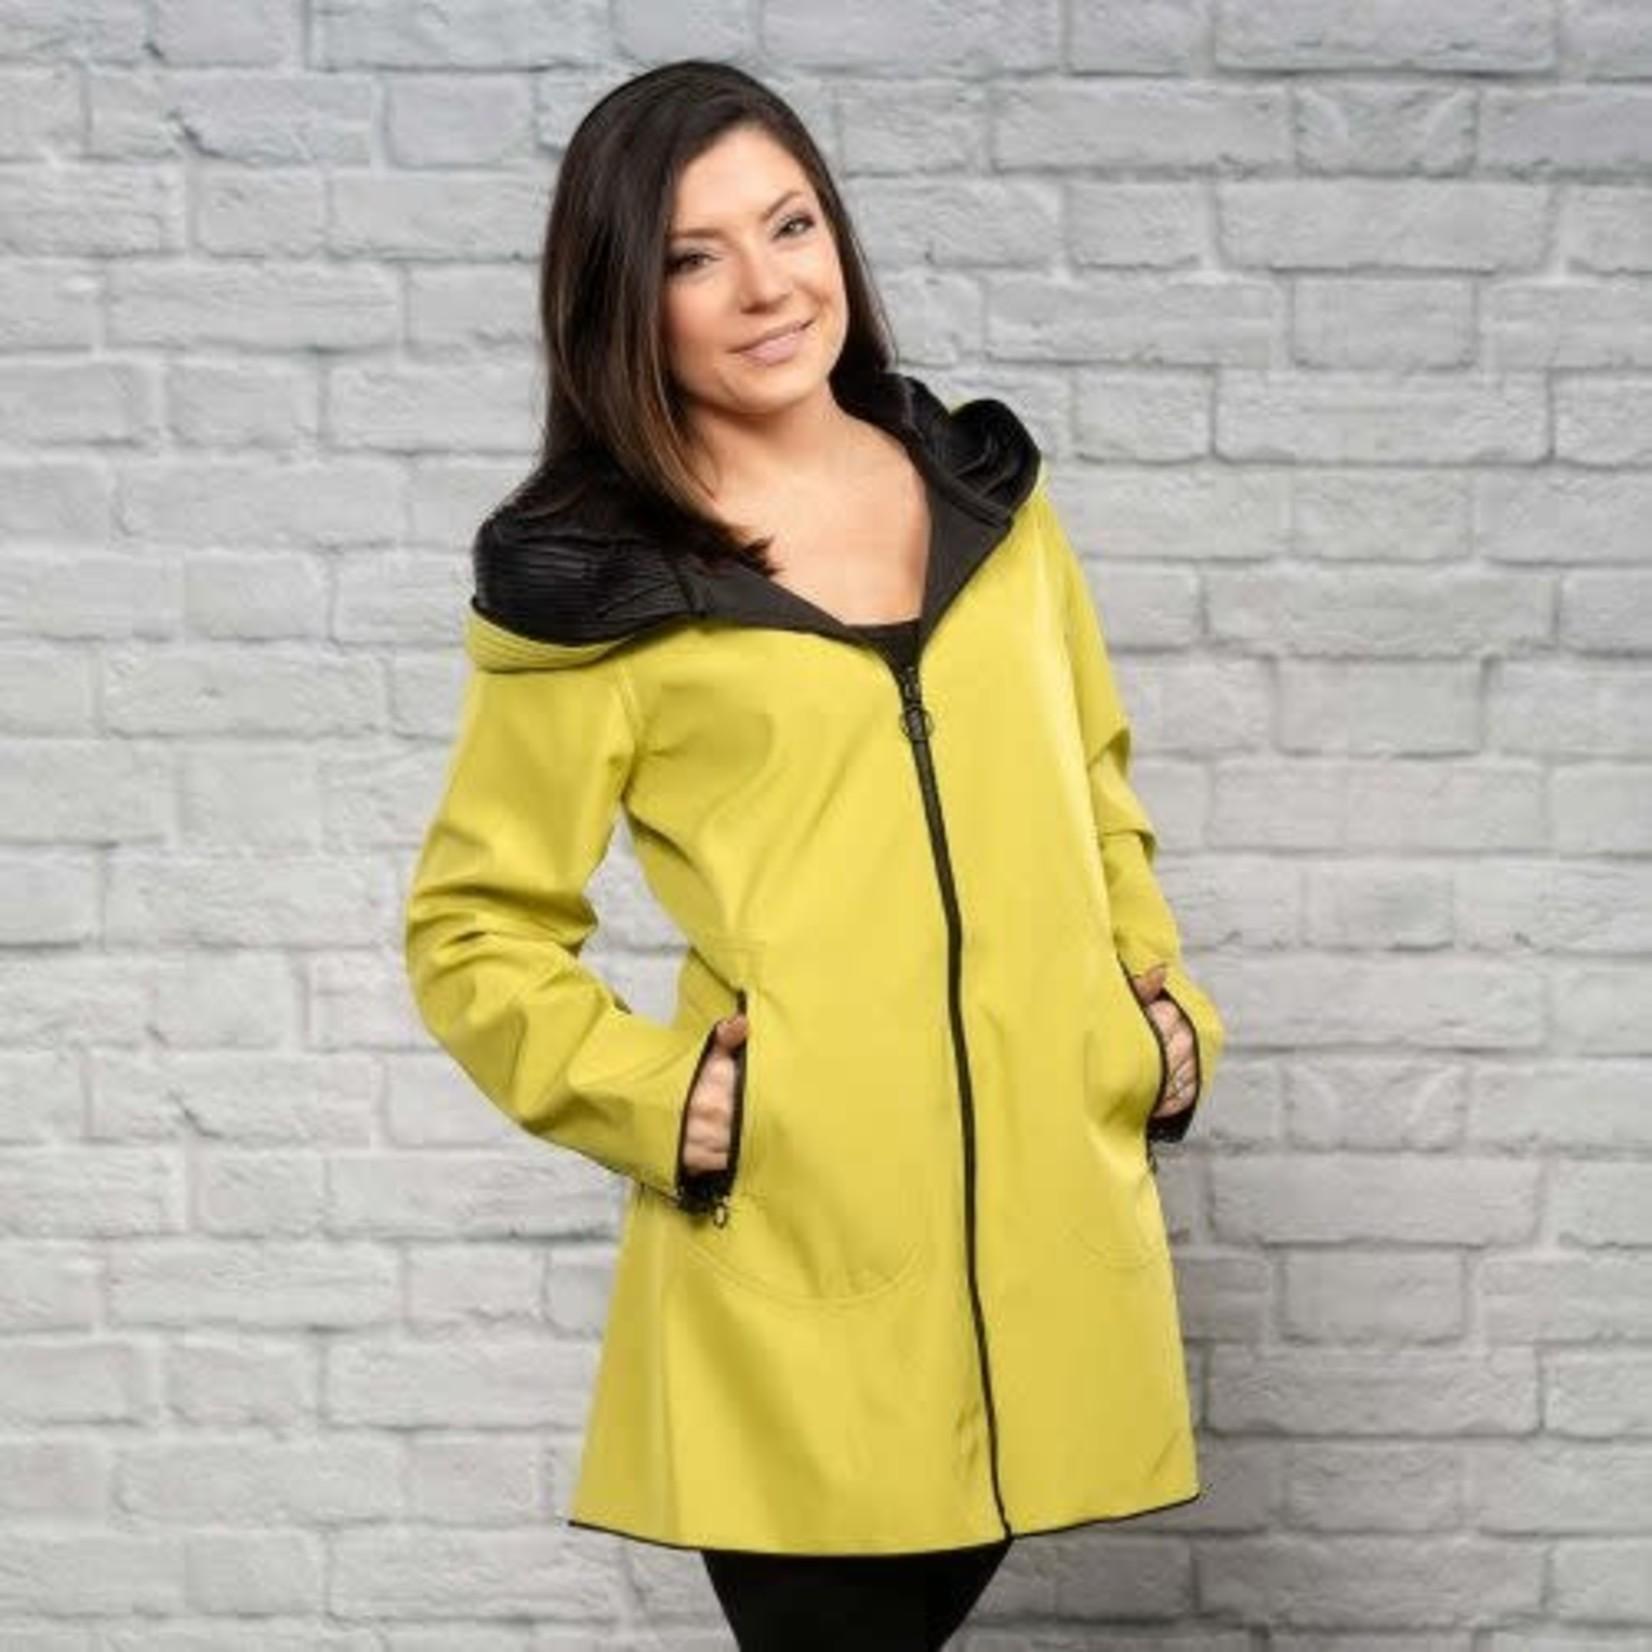 Ubu Chartreuse/Black Reversible Pleated Hooded Jacket